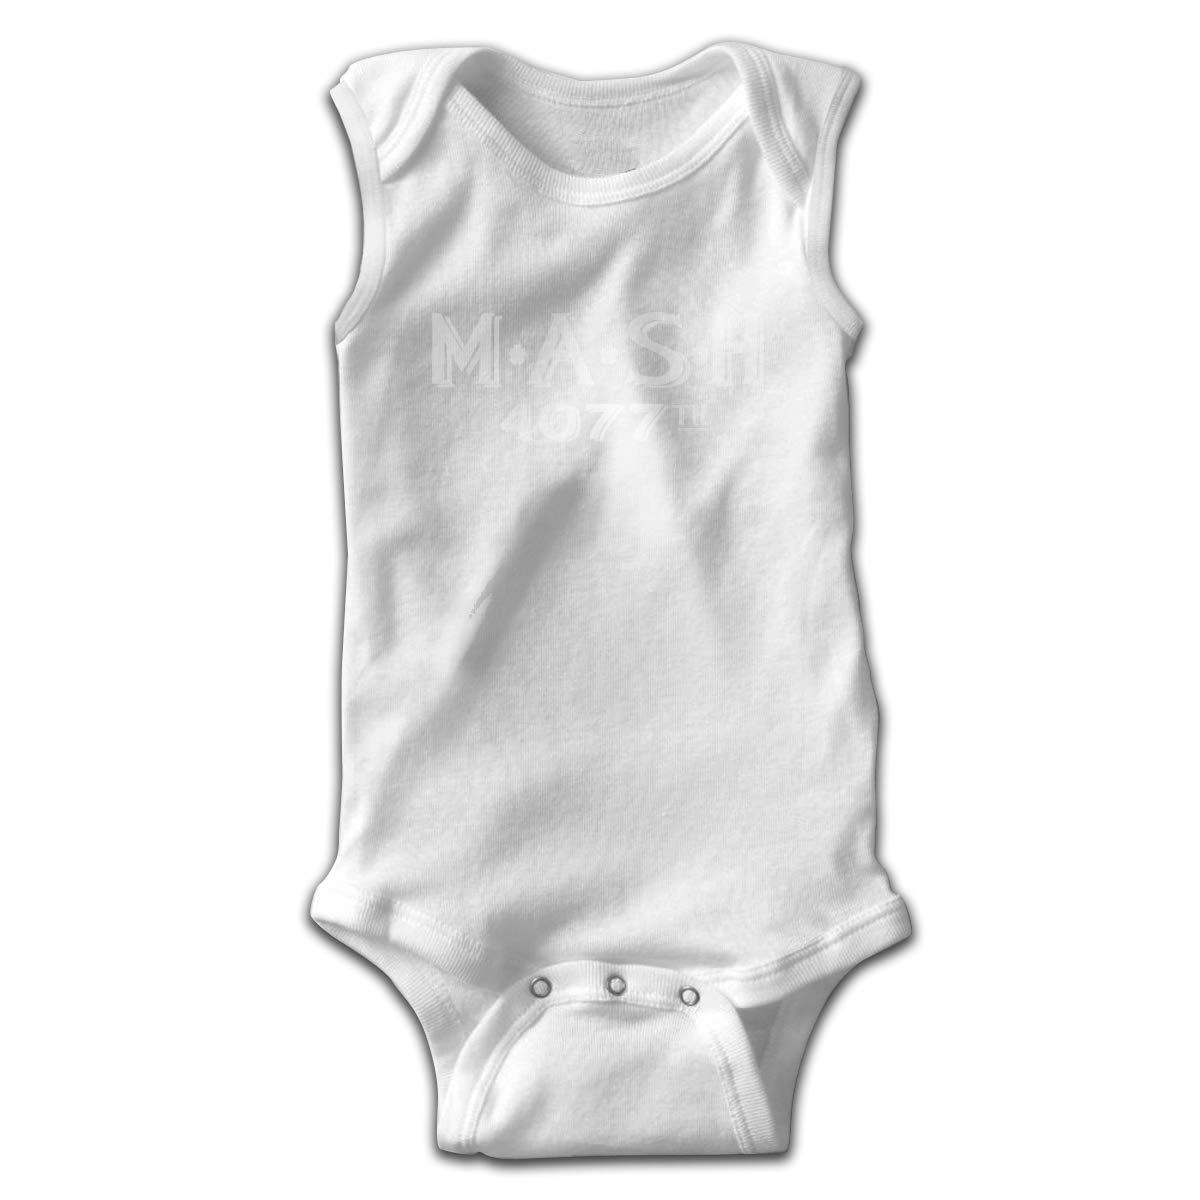 Dfenere MASH Distressed Hedging Newborn Baby No Sleeve Bodysuit Romper Infant Summer Clothing Black